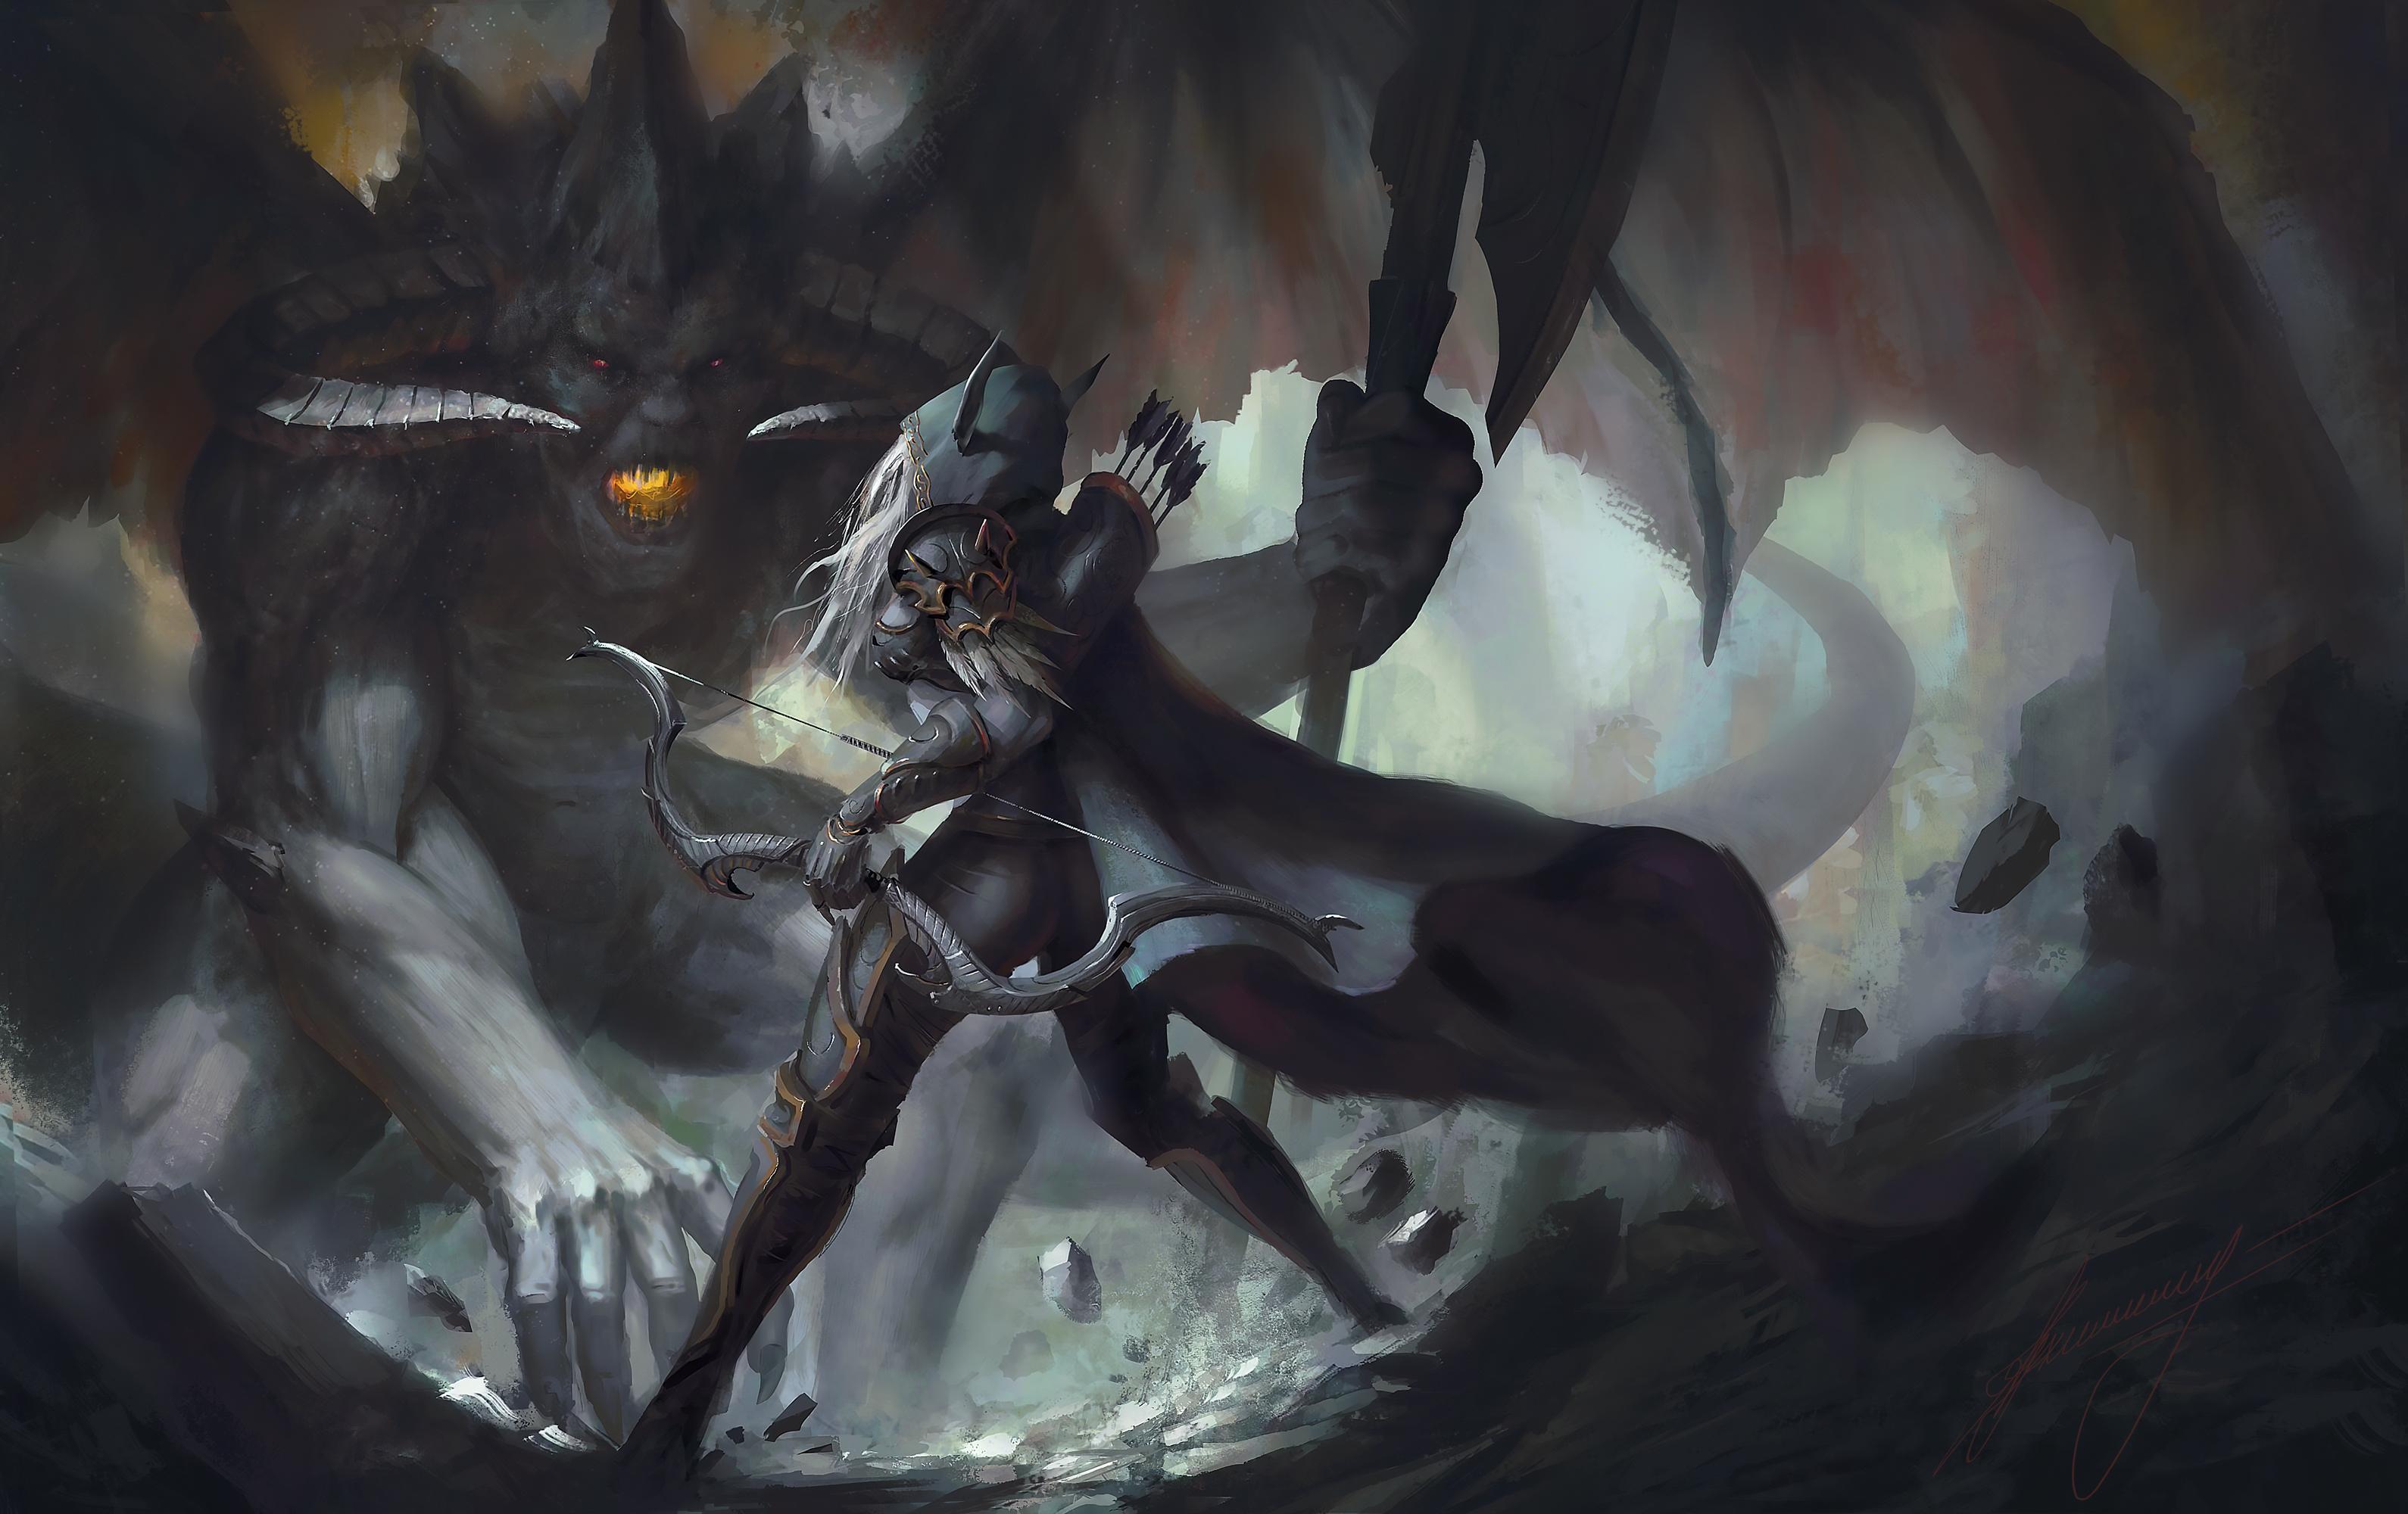 Elf vs monster cgi exposed comic